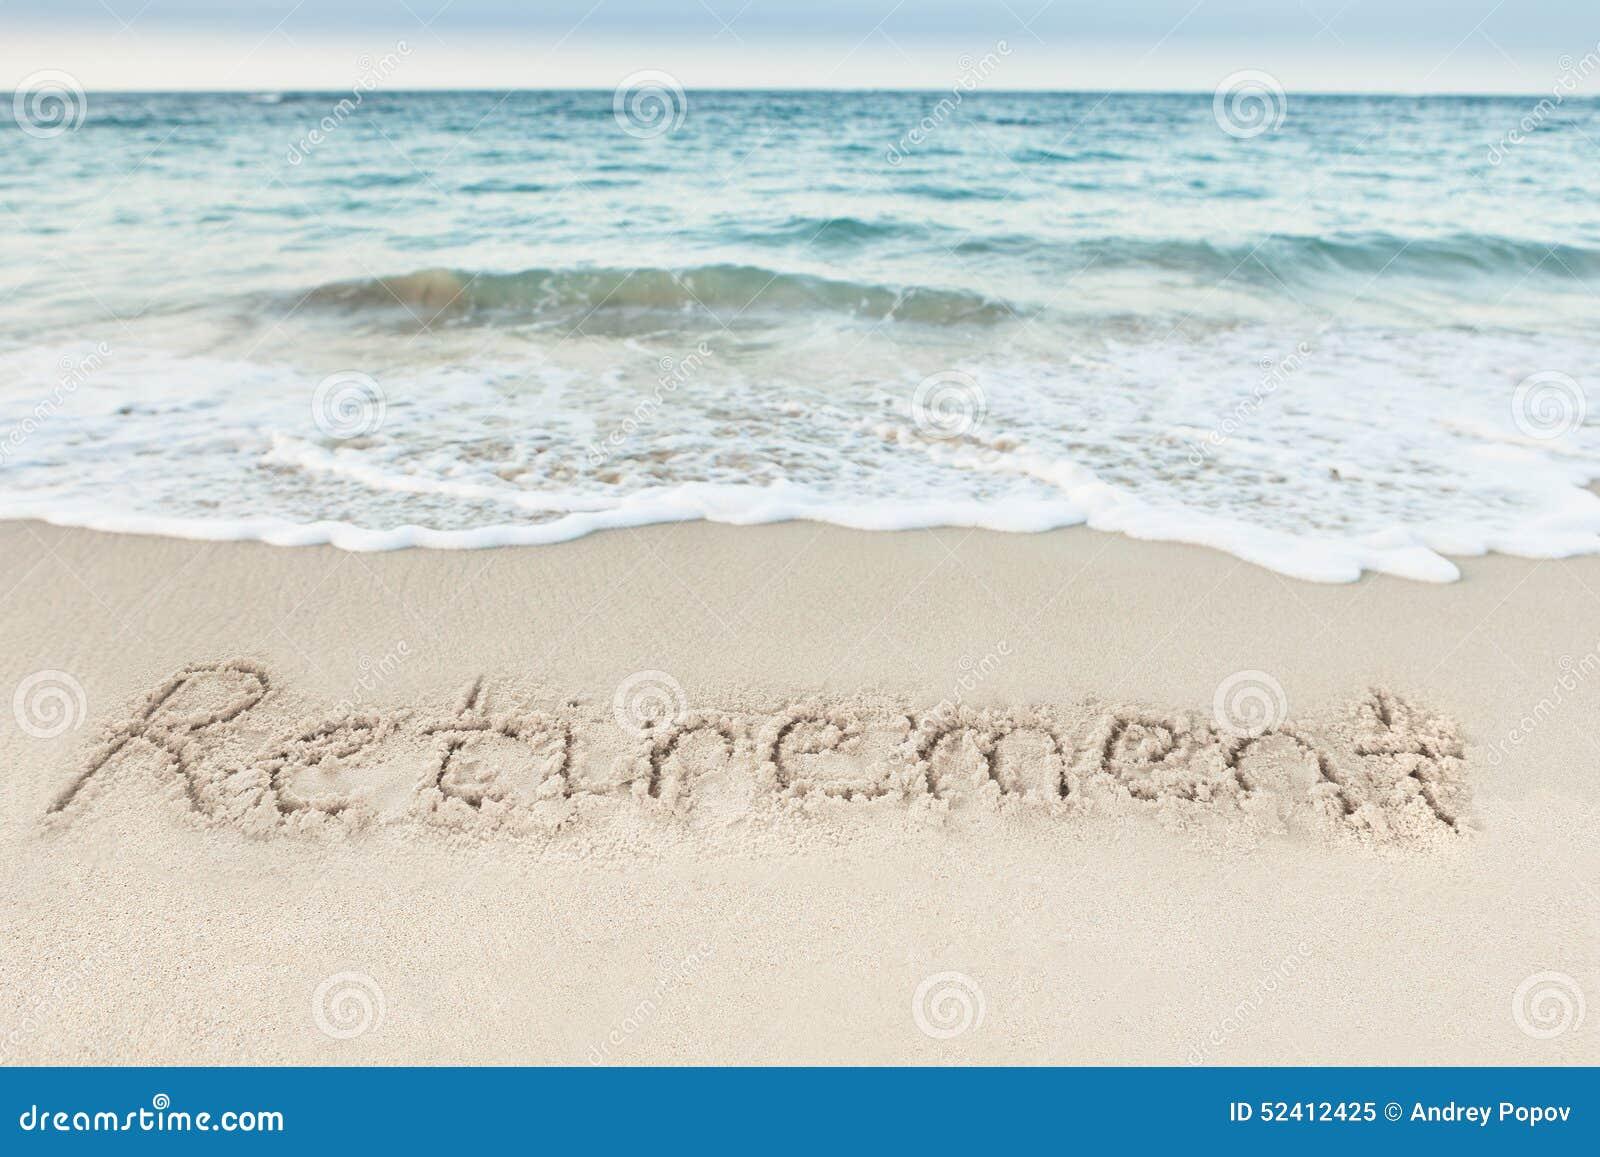 Free Retirement Invitations is perfect invitations ideas